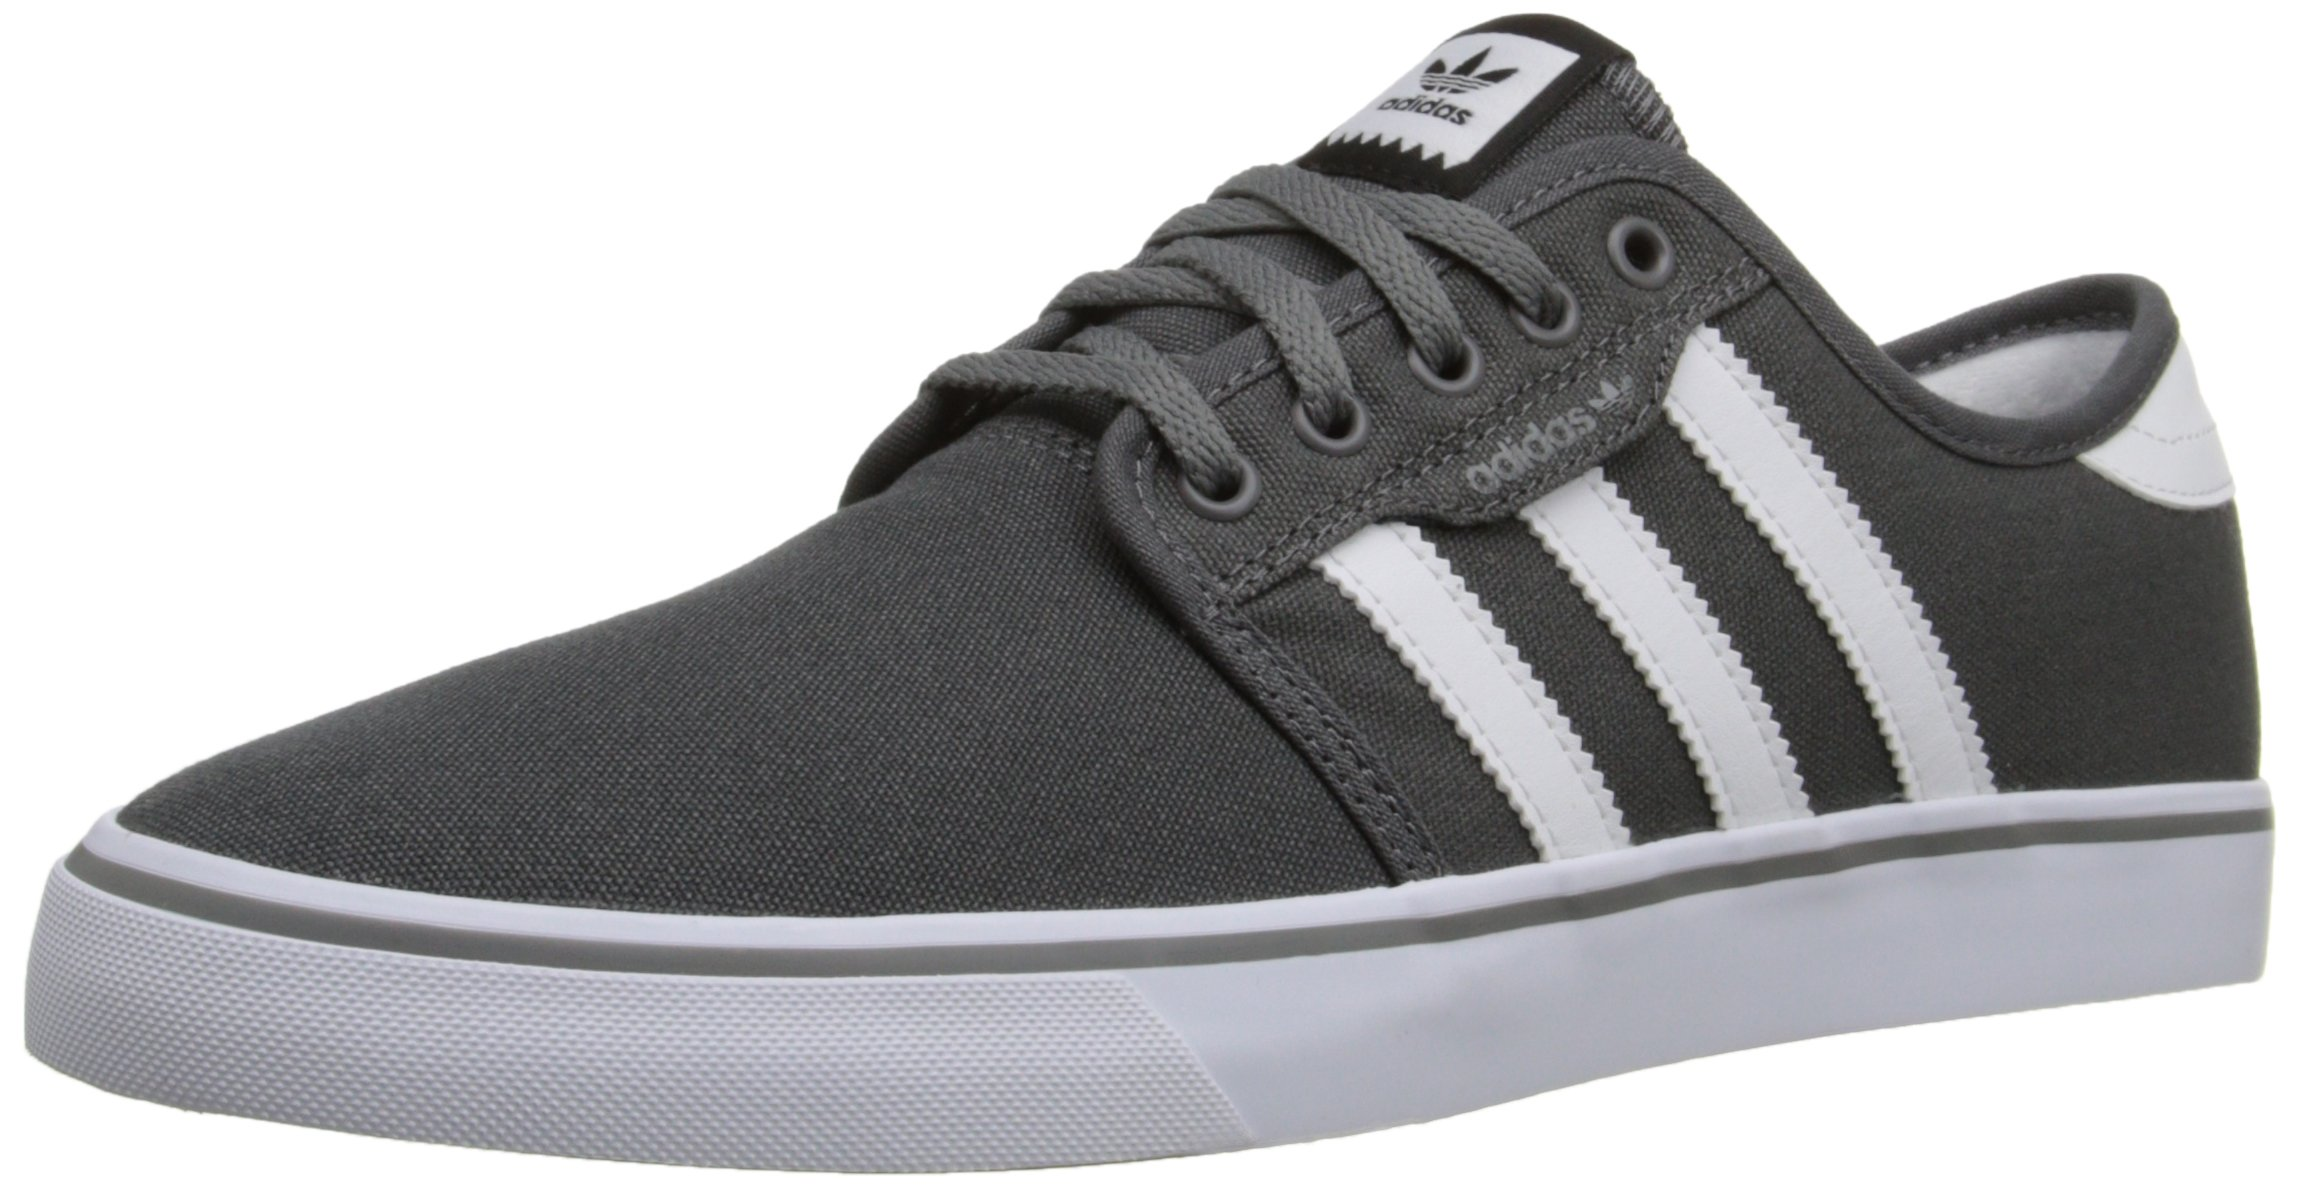 adidas Originals Men's Seeley Skate Shoe,Ash Grey/White/Black,8 M US